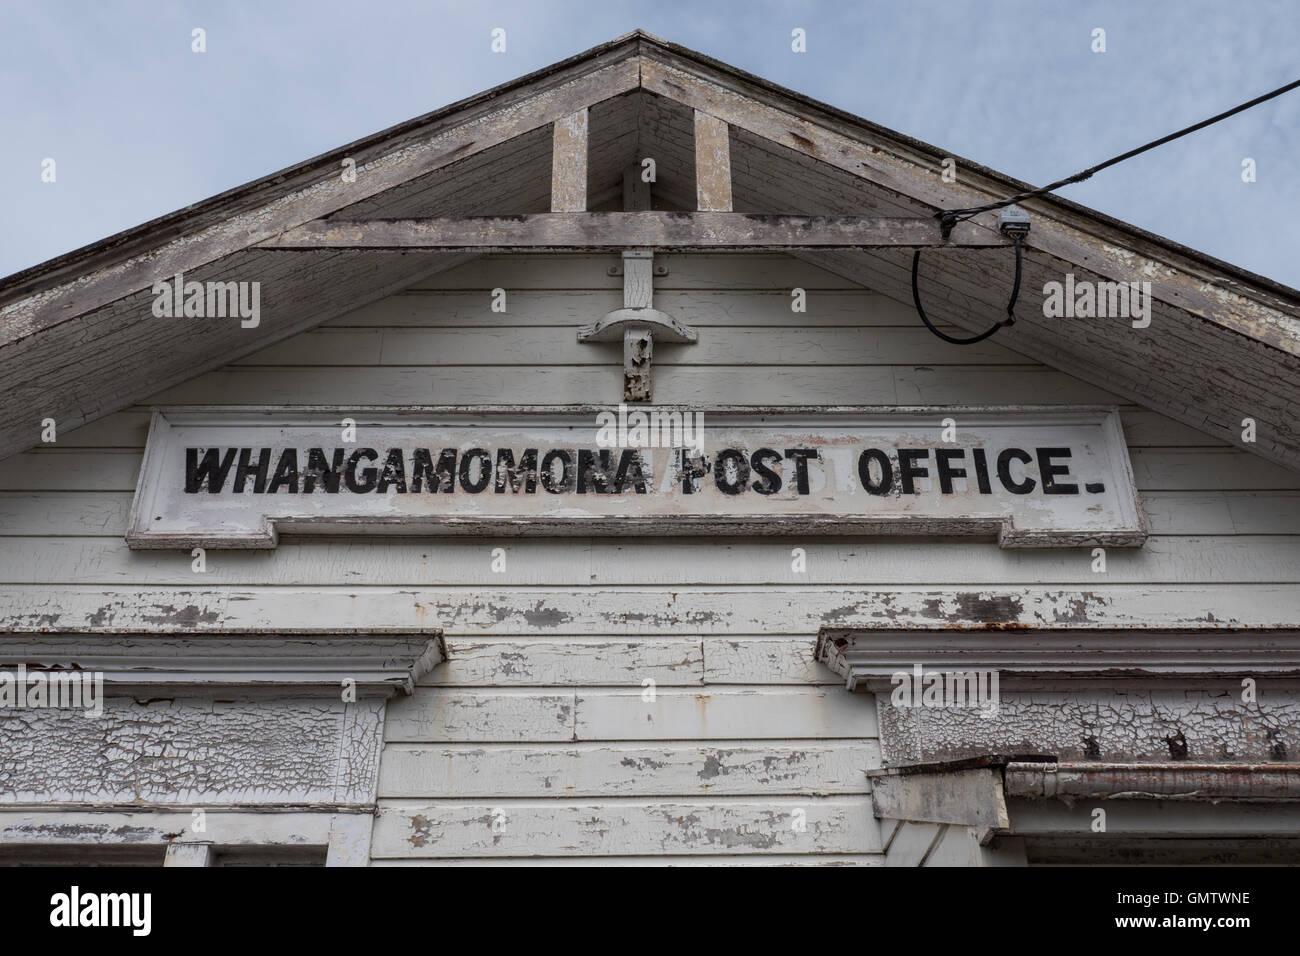 Whangamomona post office Taranaki, North Island, New Zealand. - Stock Image